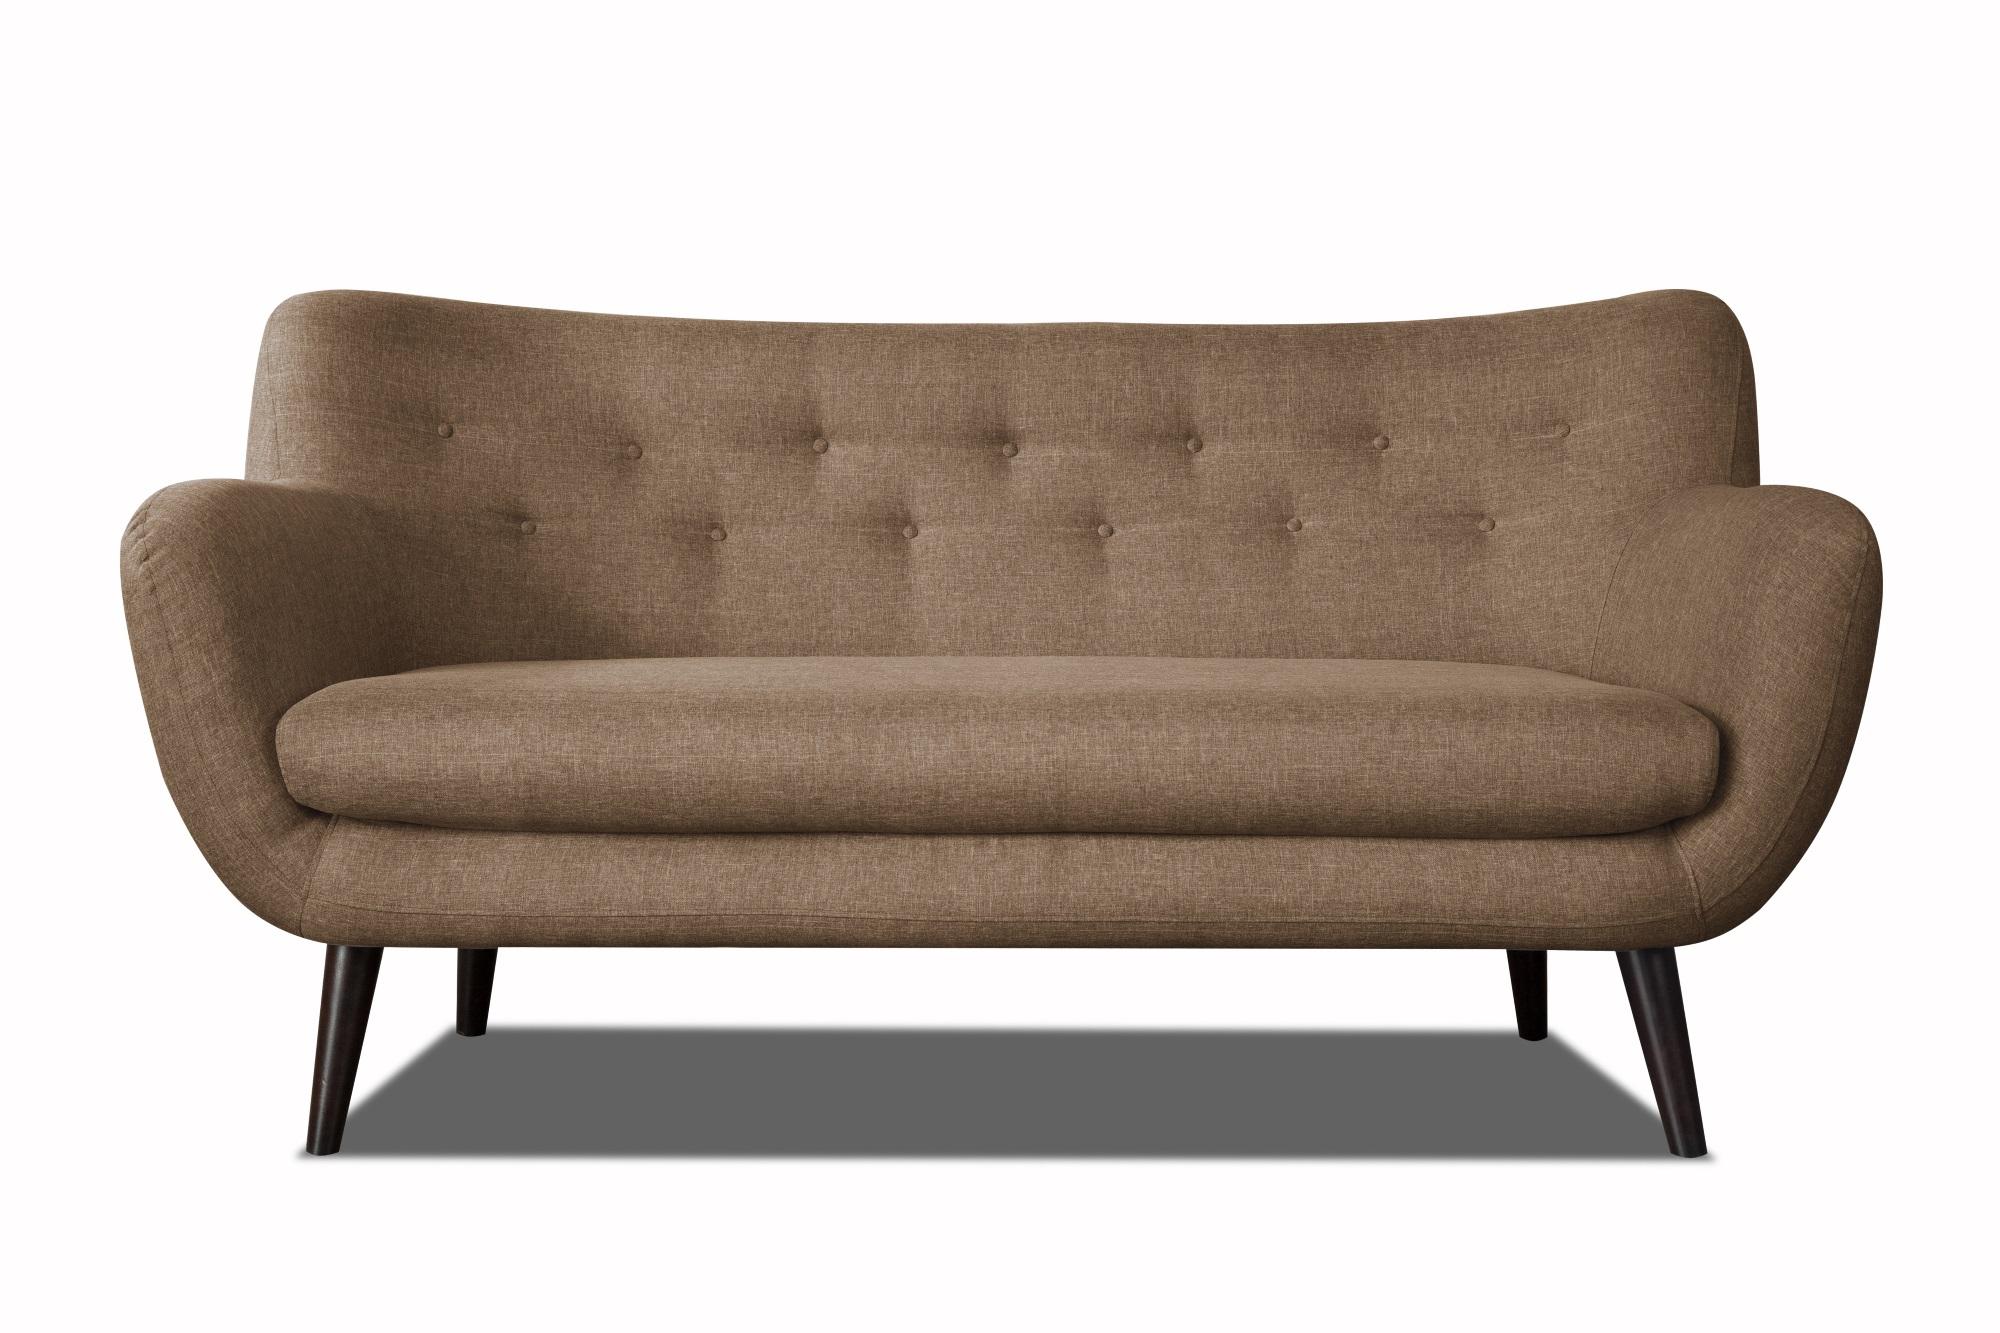 Canapé 3 places design en tissu brun Axelle